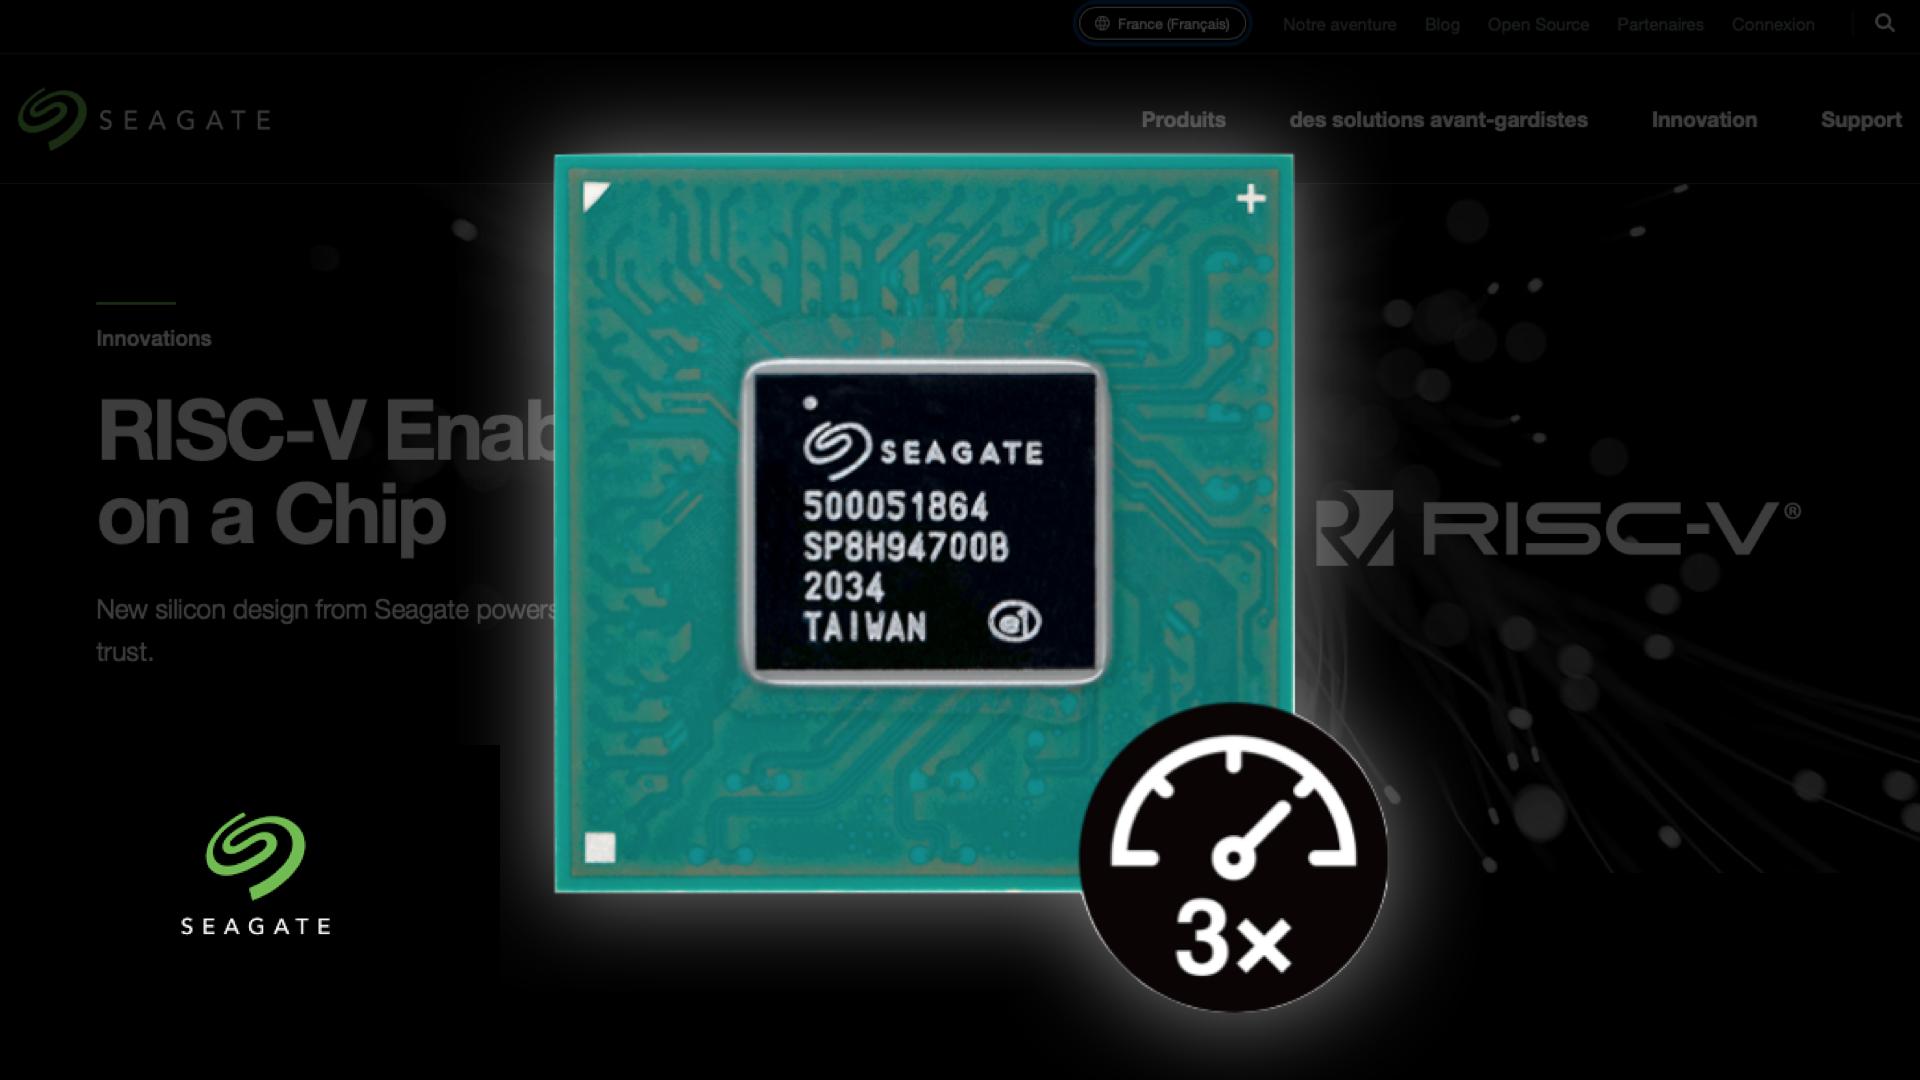 Un fabricant de disques dur est-il en train de concevoir les futures puces RISC-V de nos smartphones ?